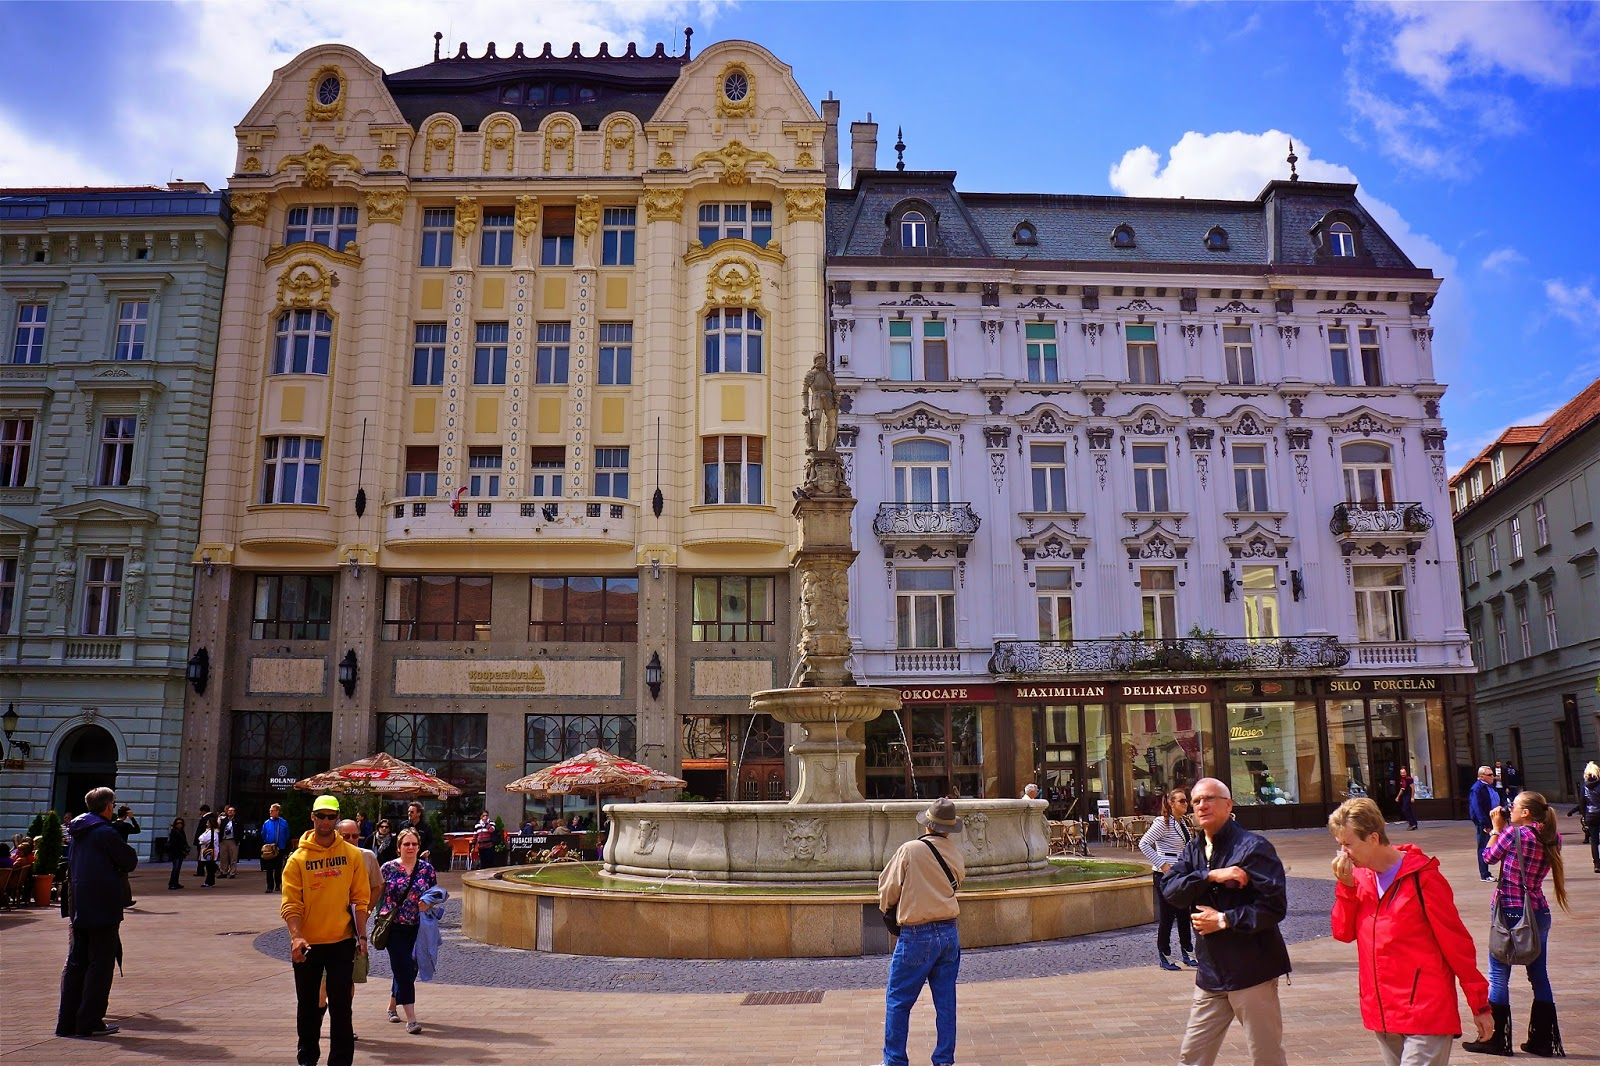 Picture of the Roland Fountain in Bratislava, Slovakia.